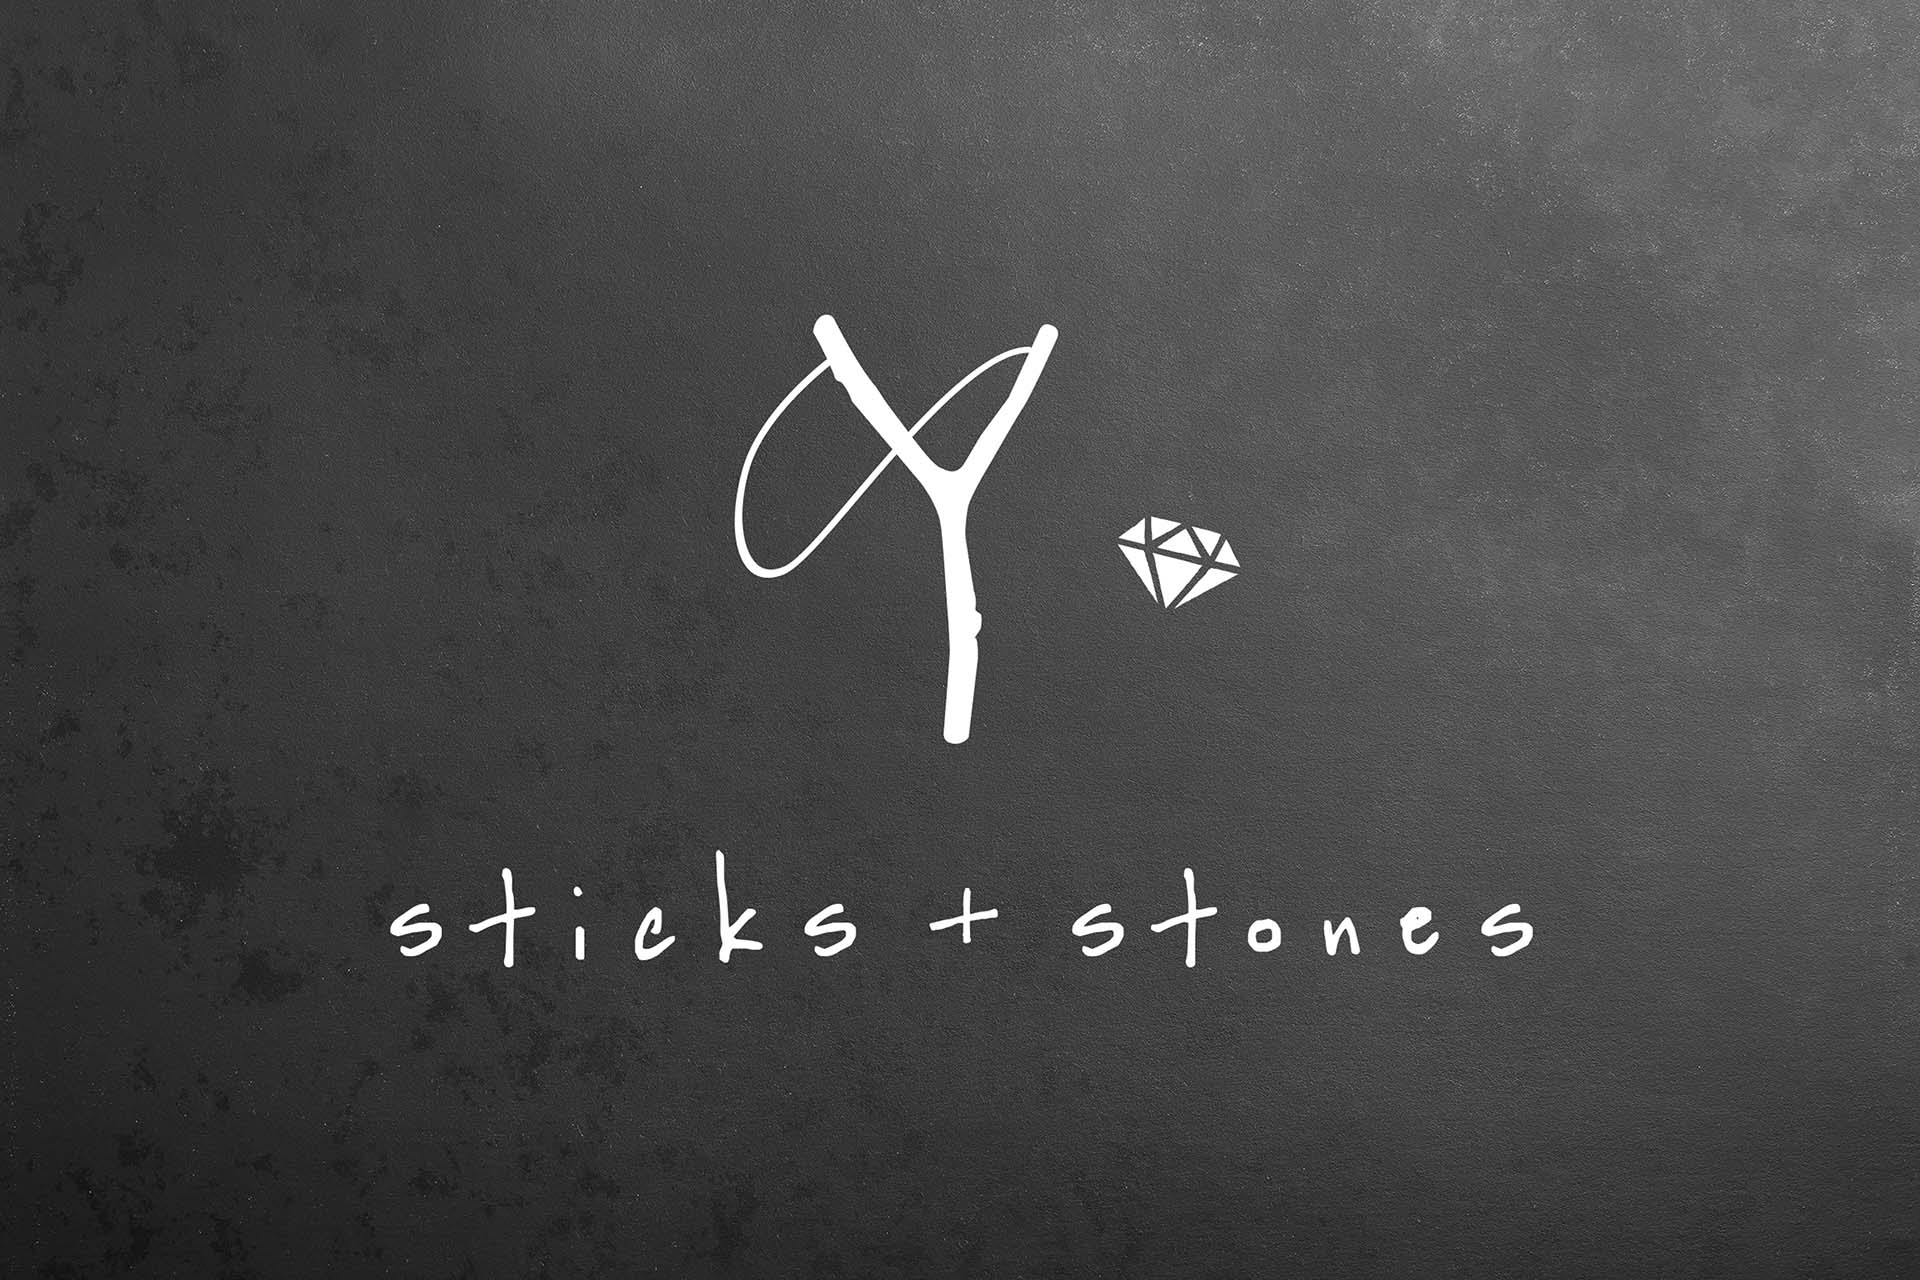 Sticks+Stones_1